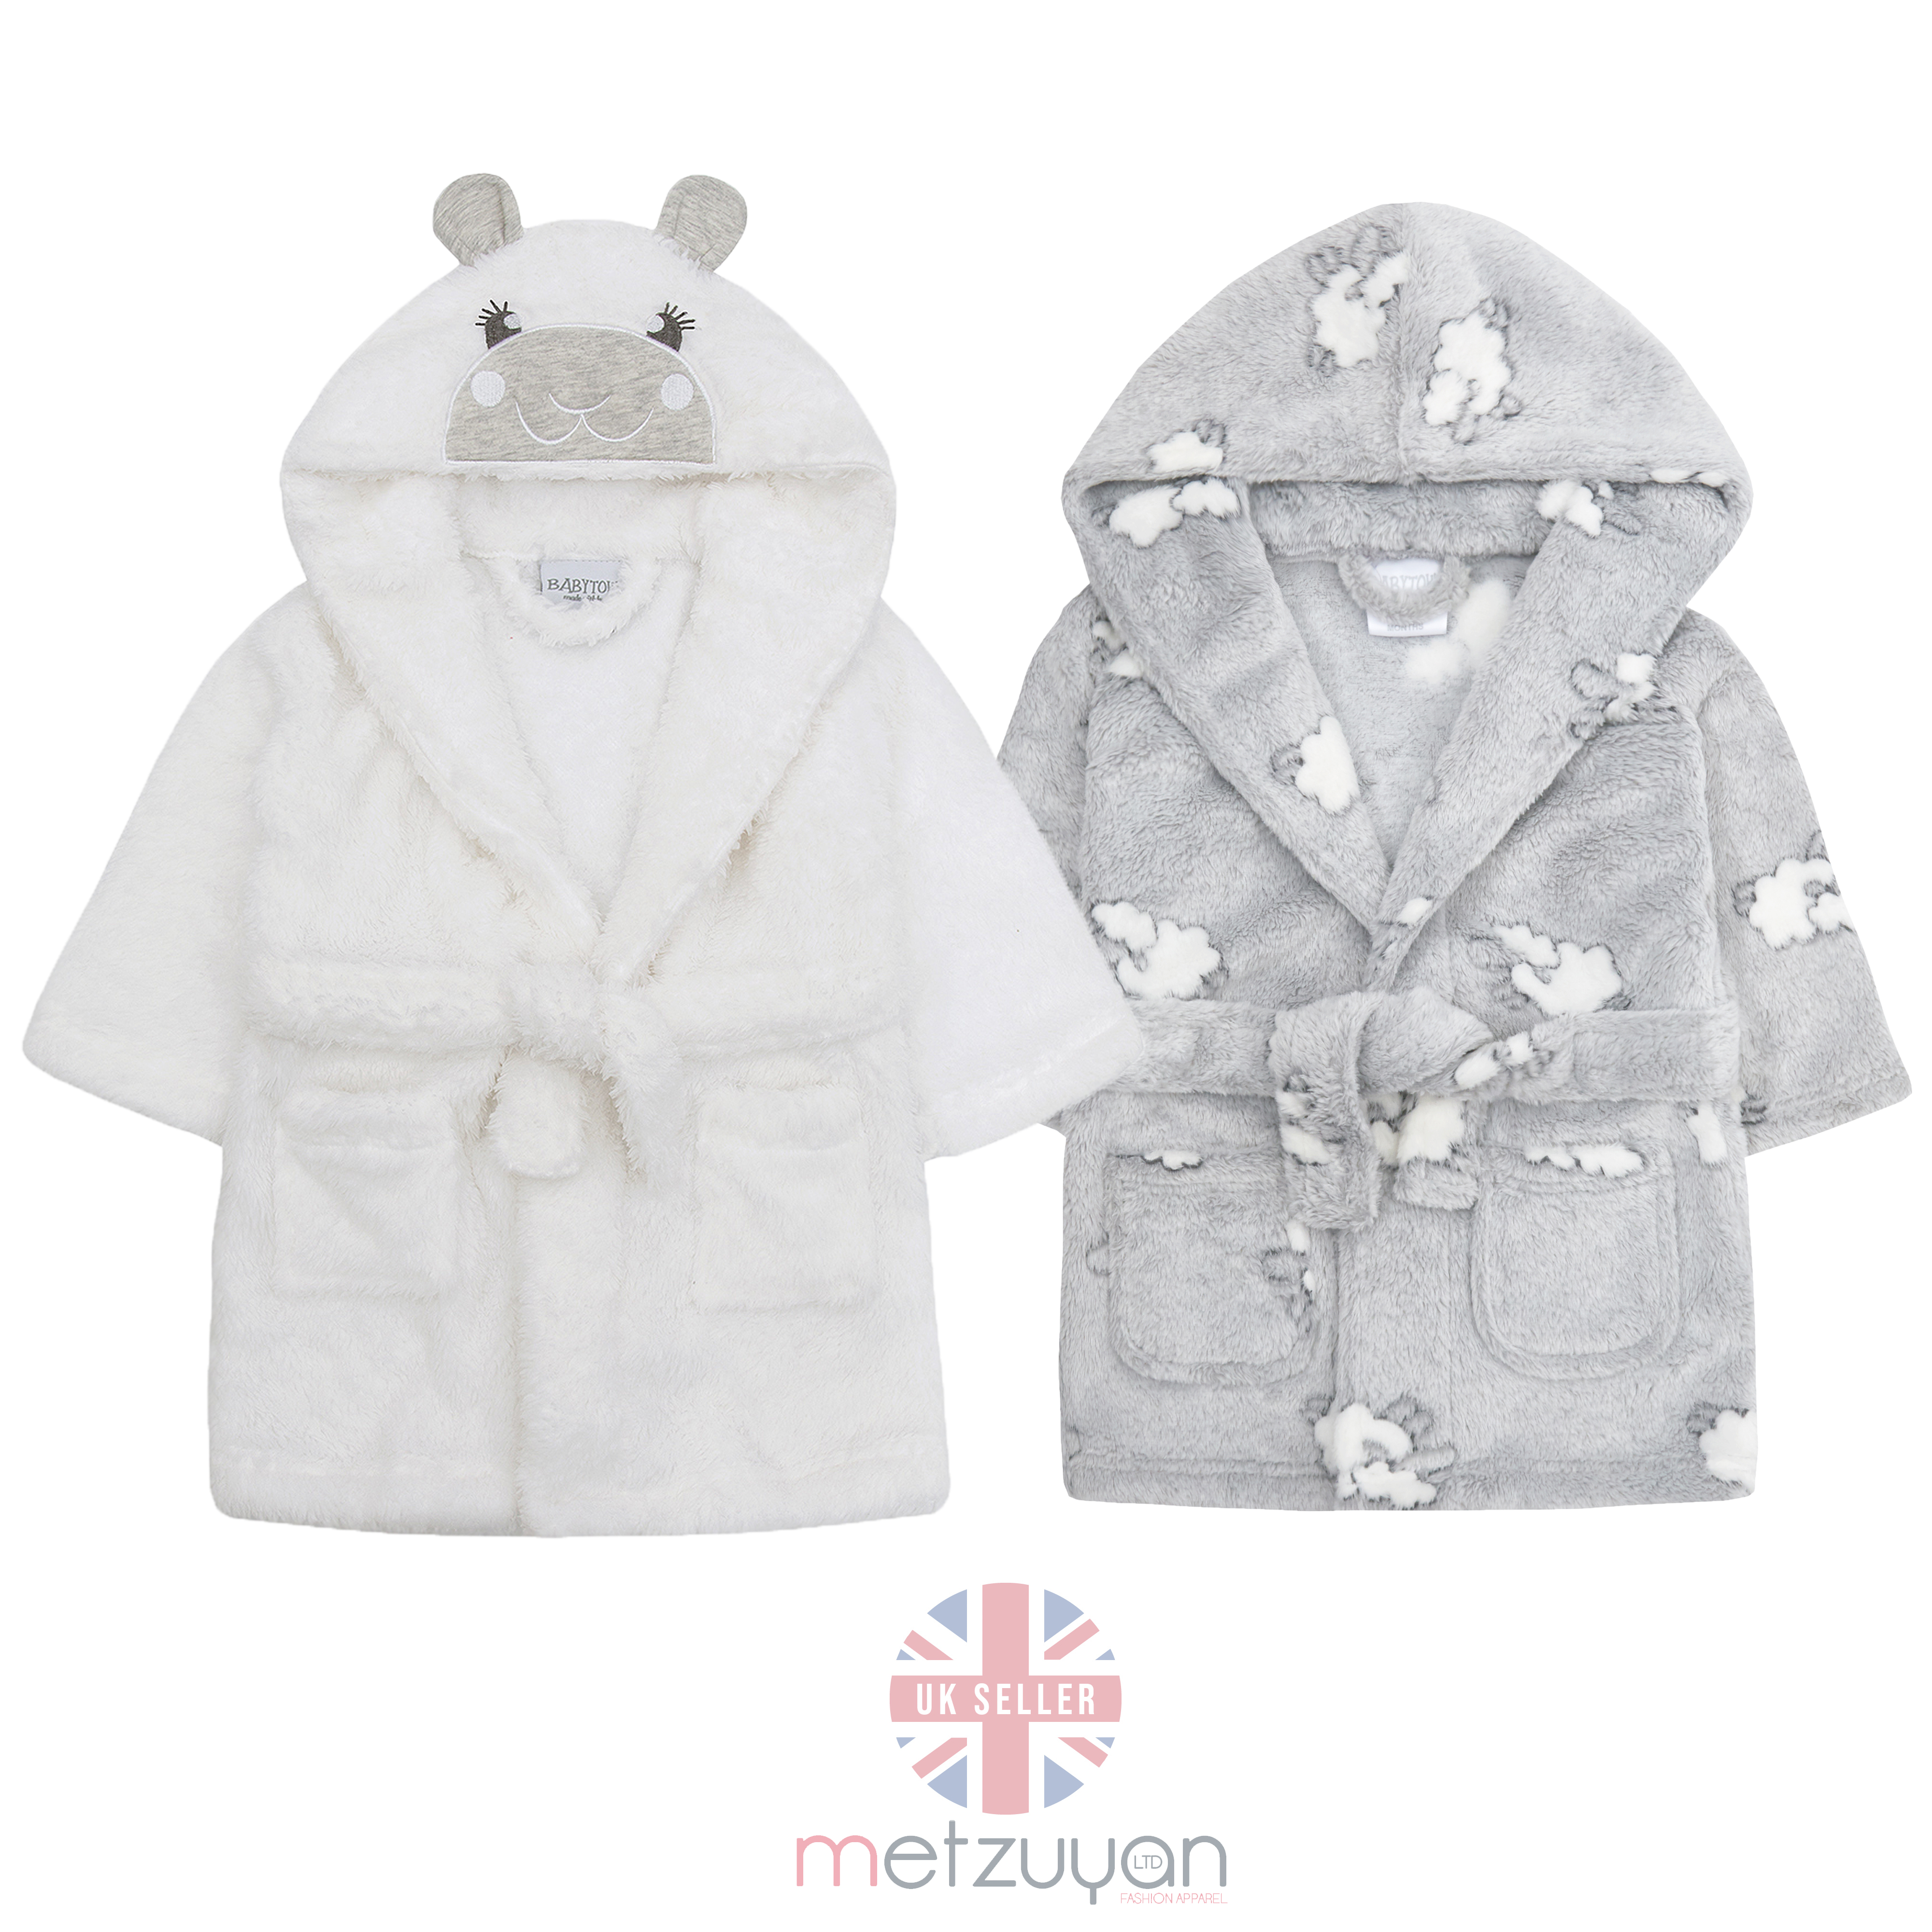 Metzuyan Baby Boys /& Girls Lamb Novelty Hooded Dressing Gown